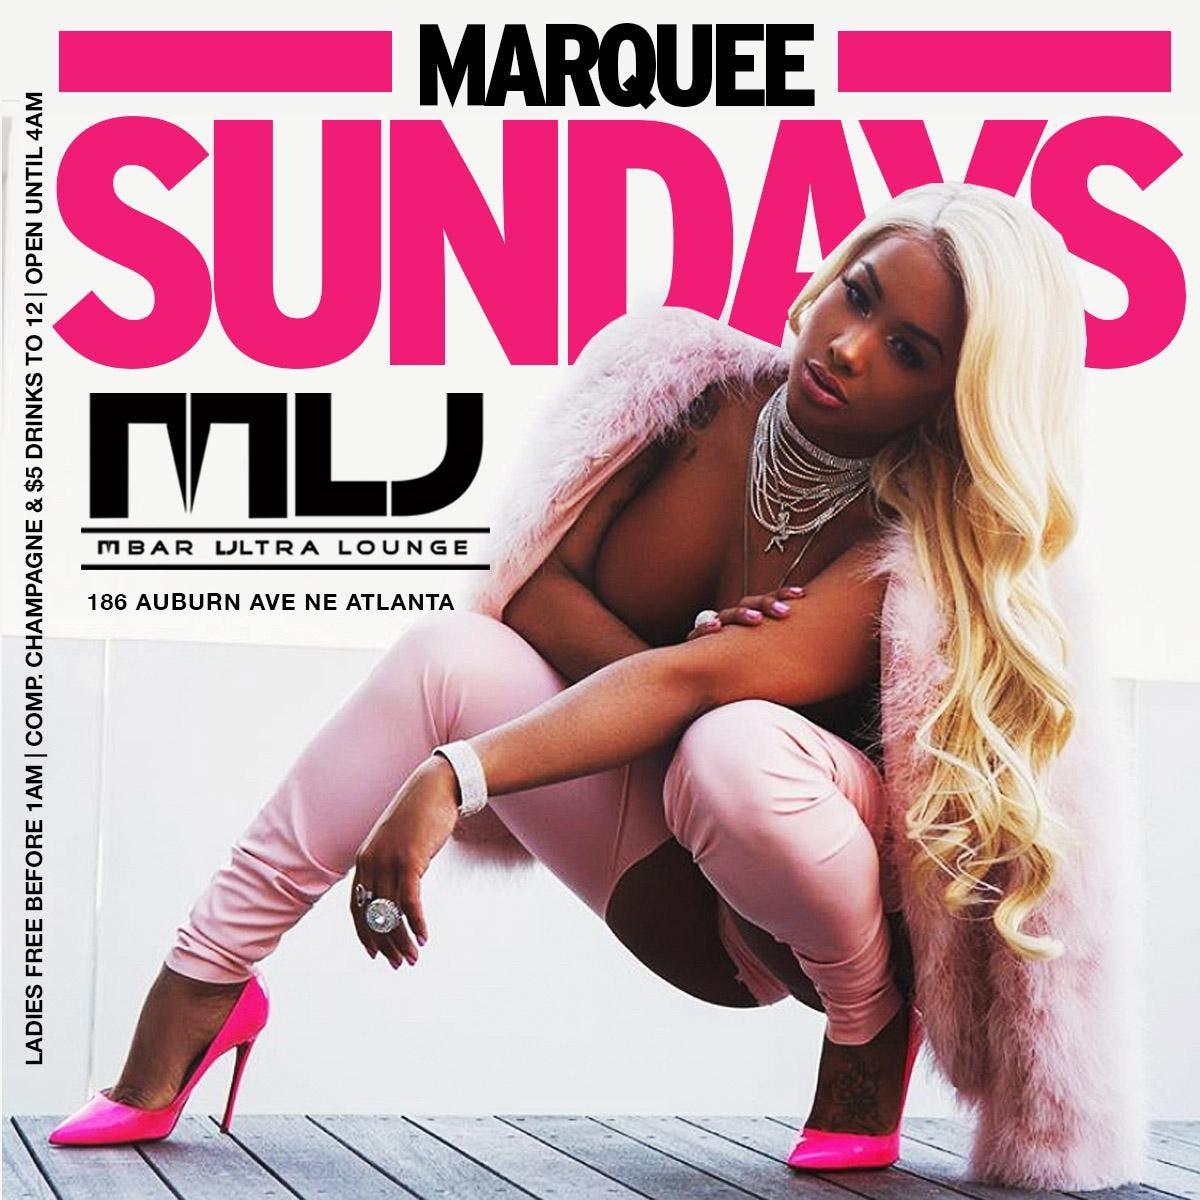 Marquee Sundays